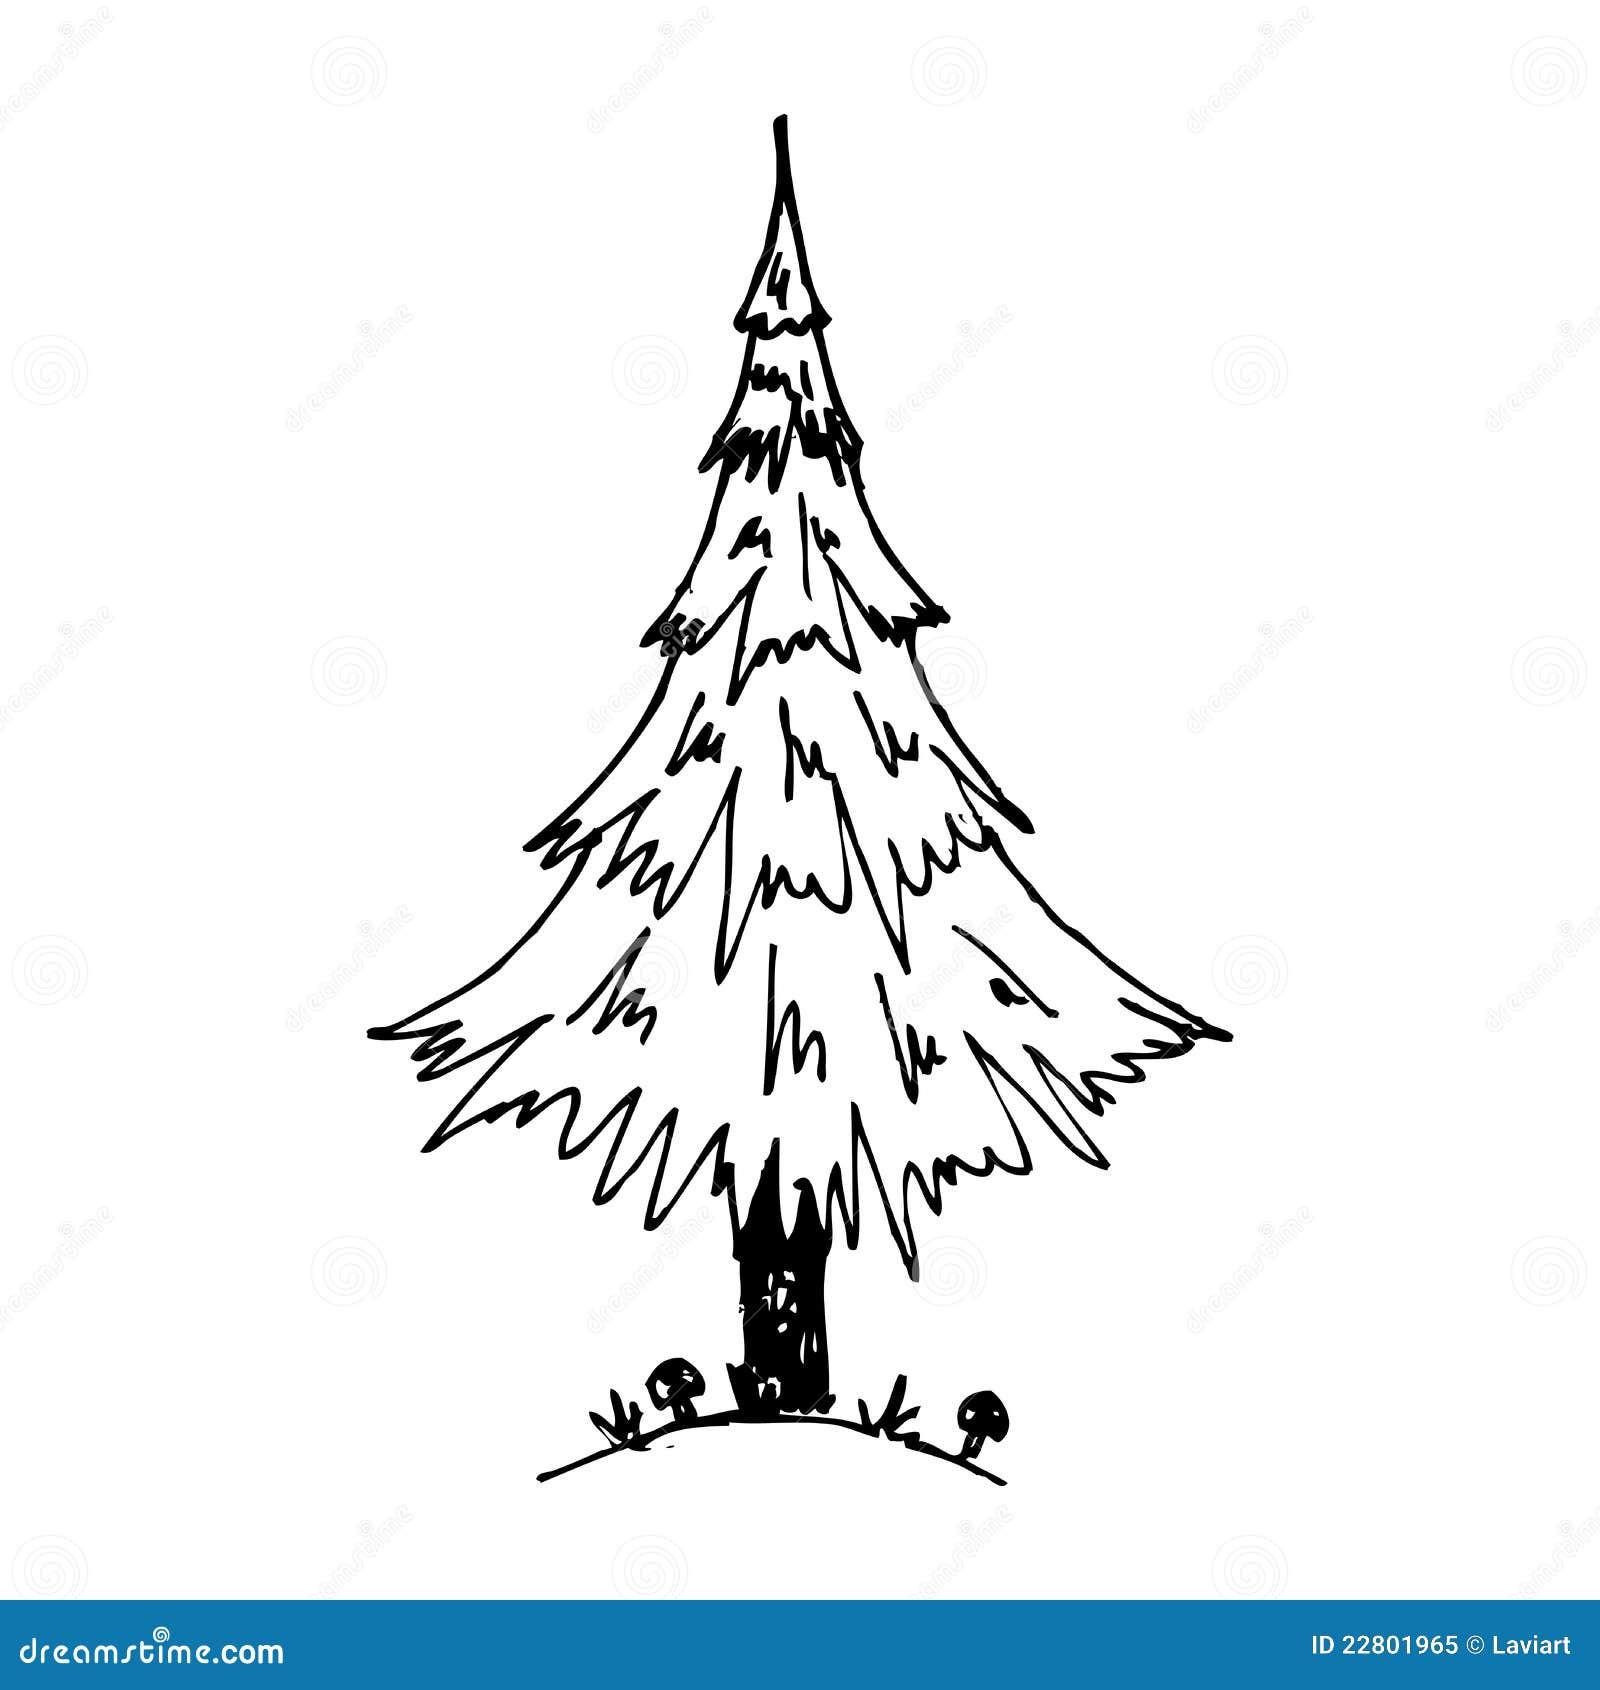 Uncategorized Pine Tree Sketch pine tree royalty free stock photo image 22801965 download tree